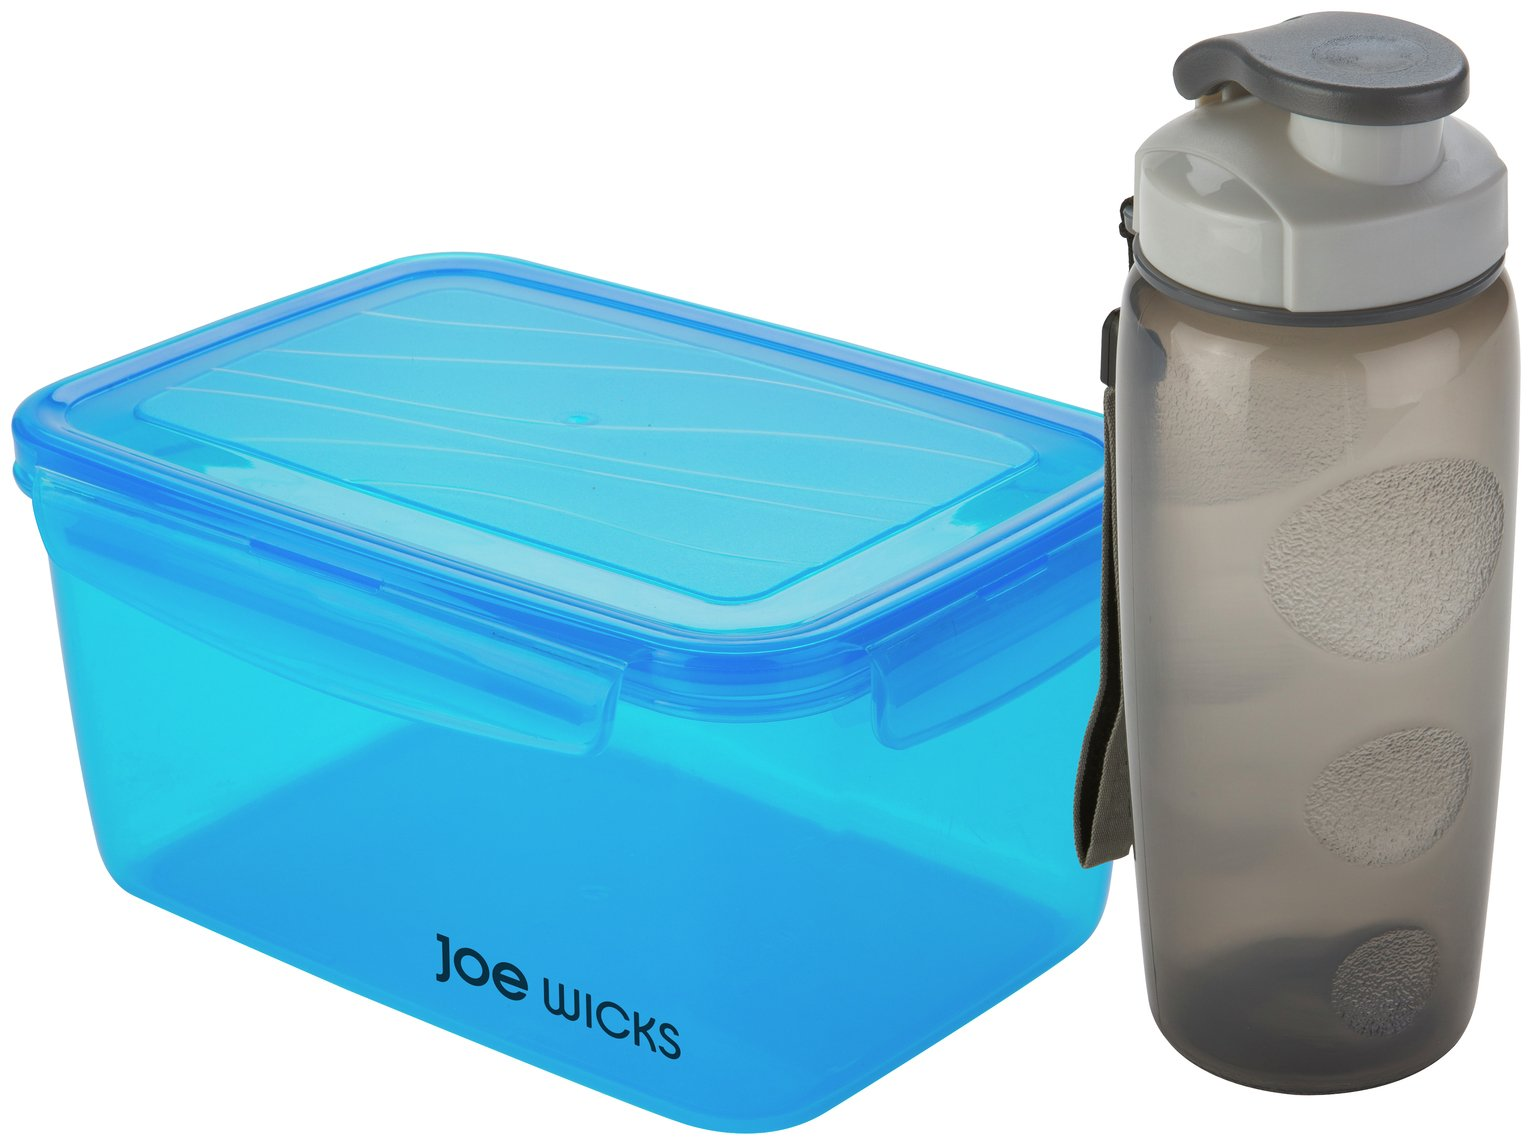 Joe Wicks Lunch Box Set